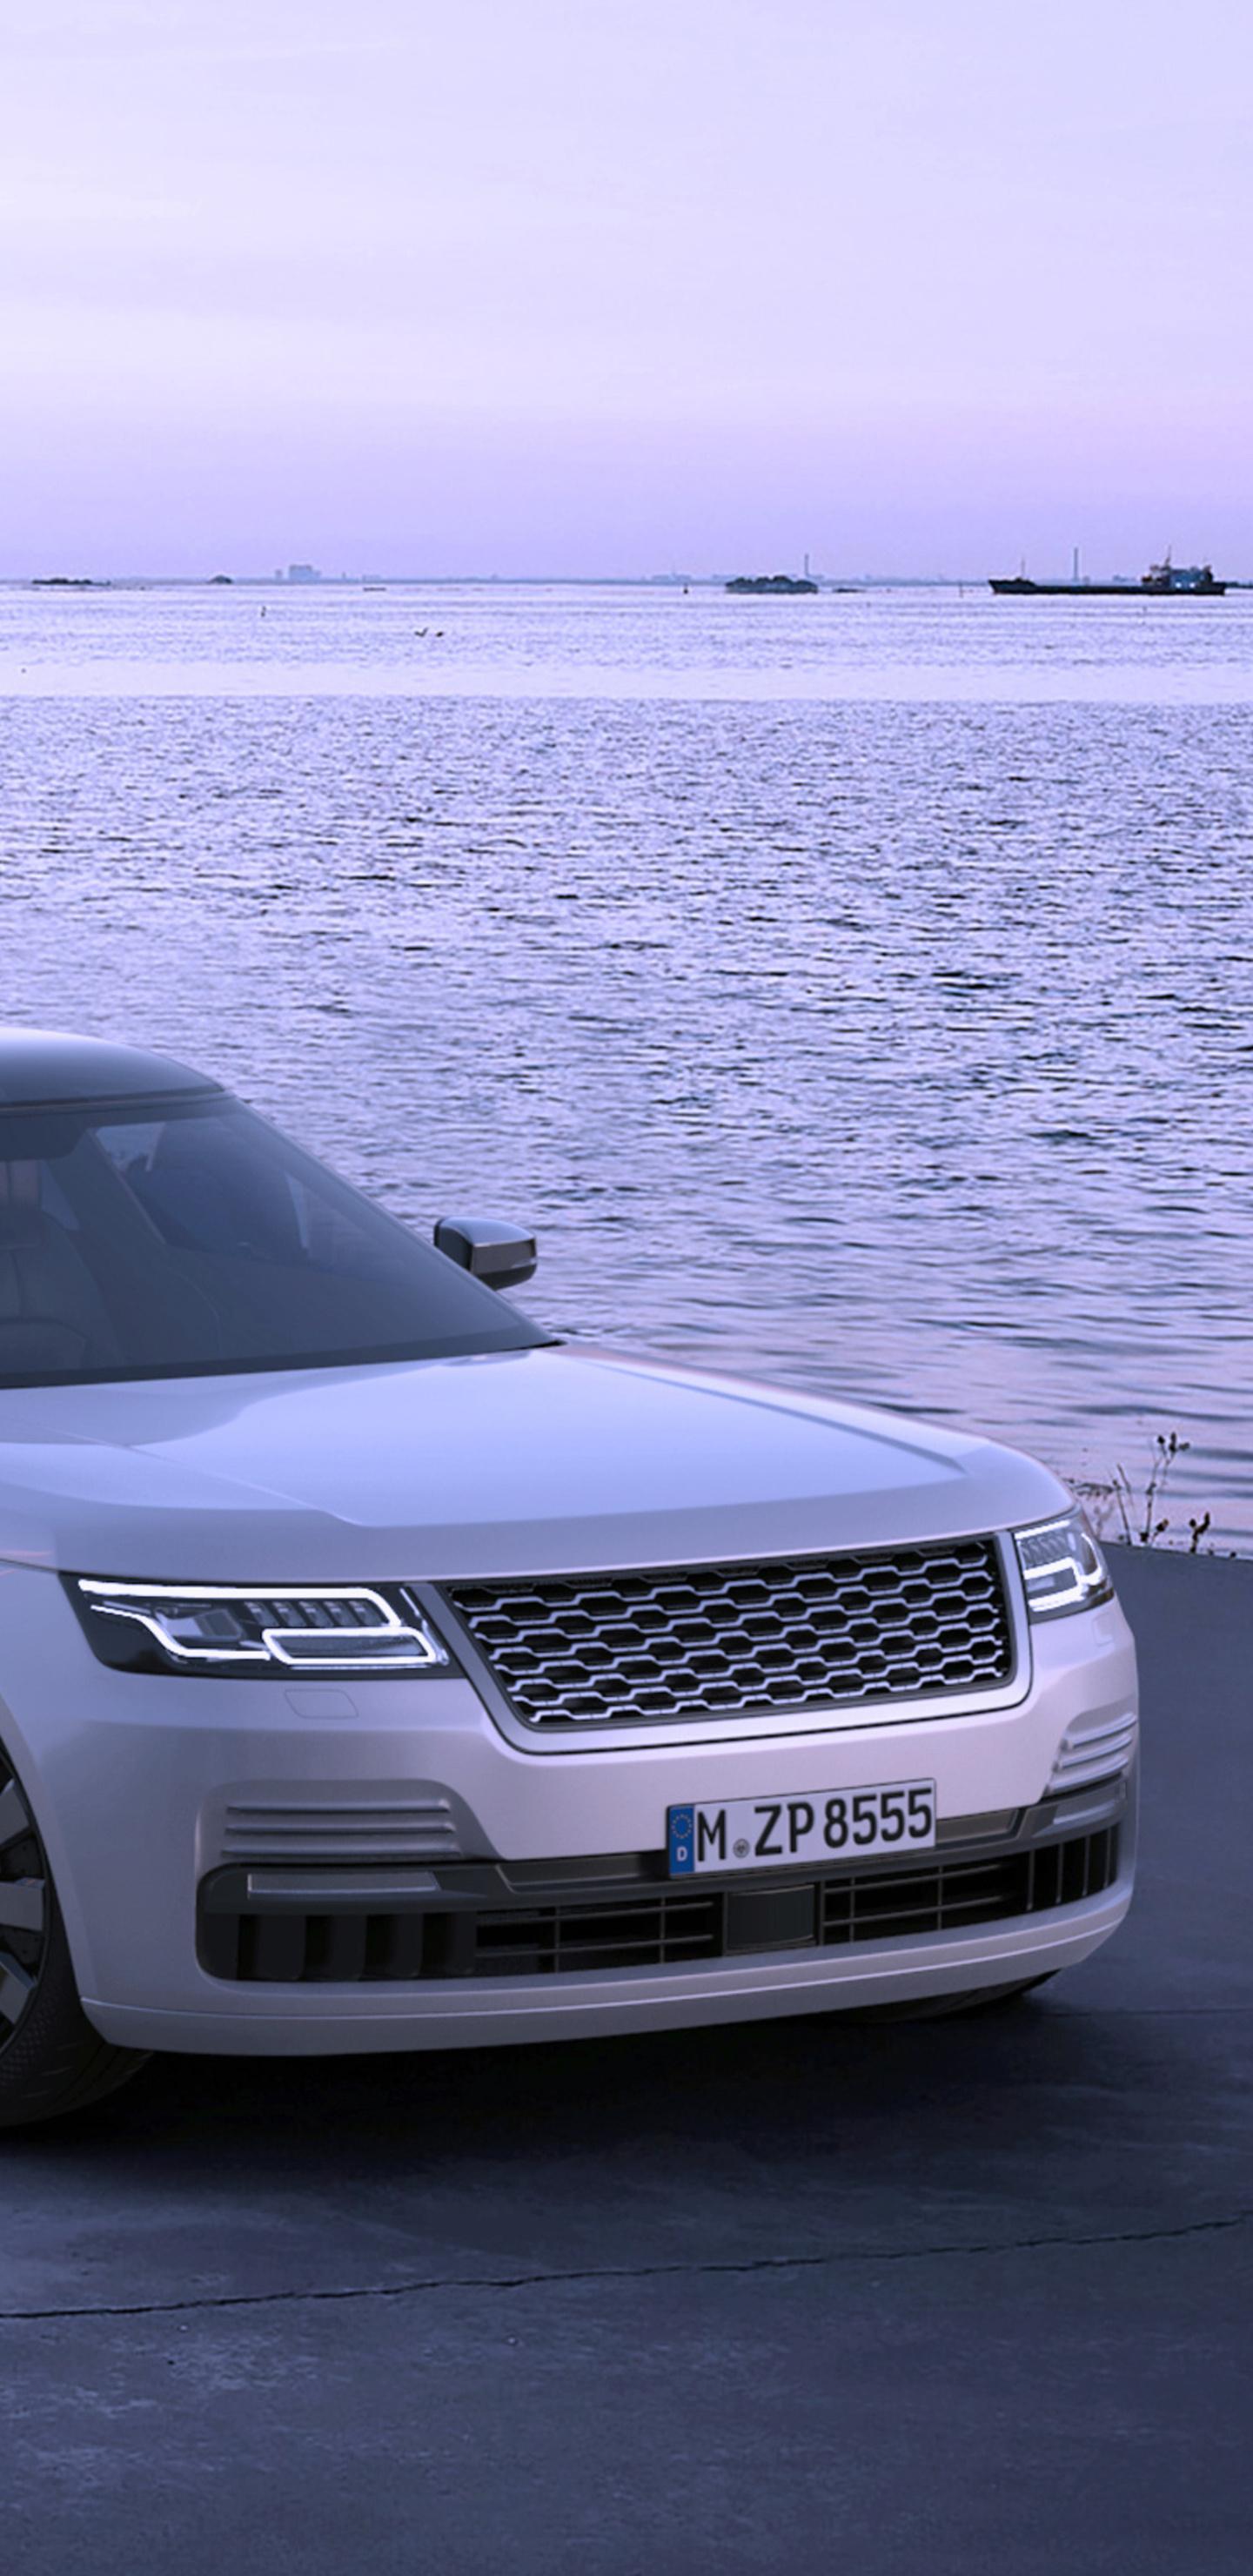 2020-land-rover-sedan-p0.jpg